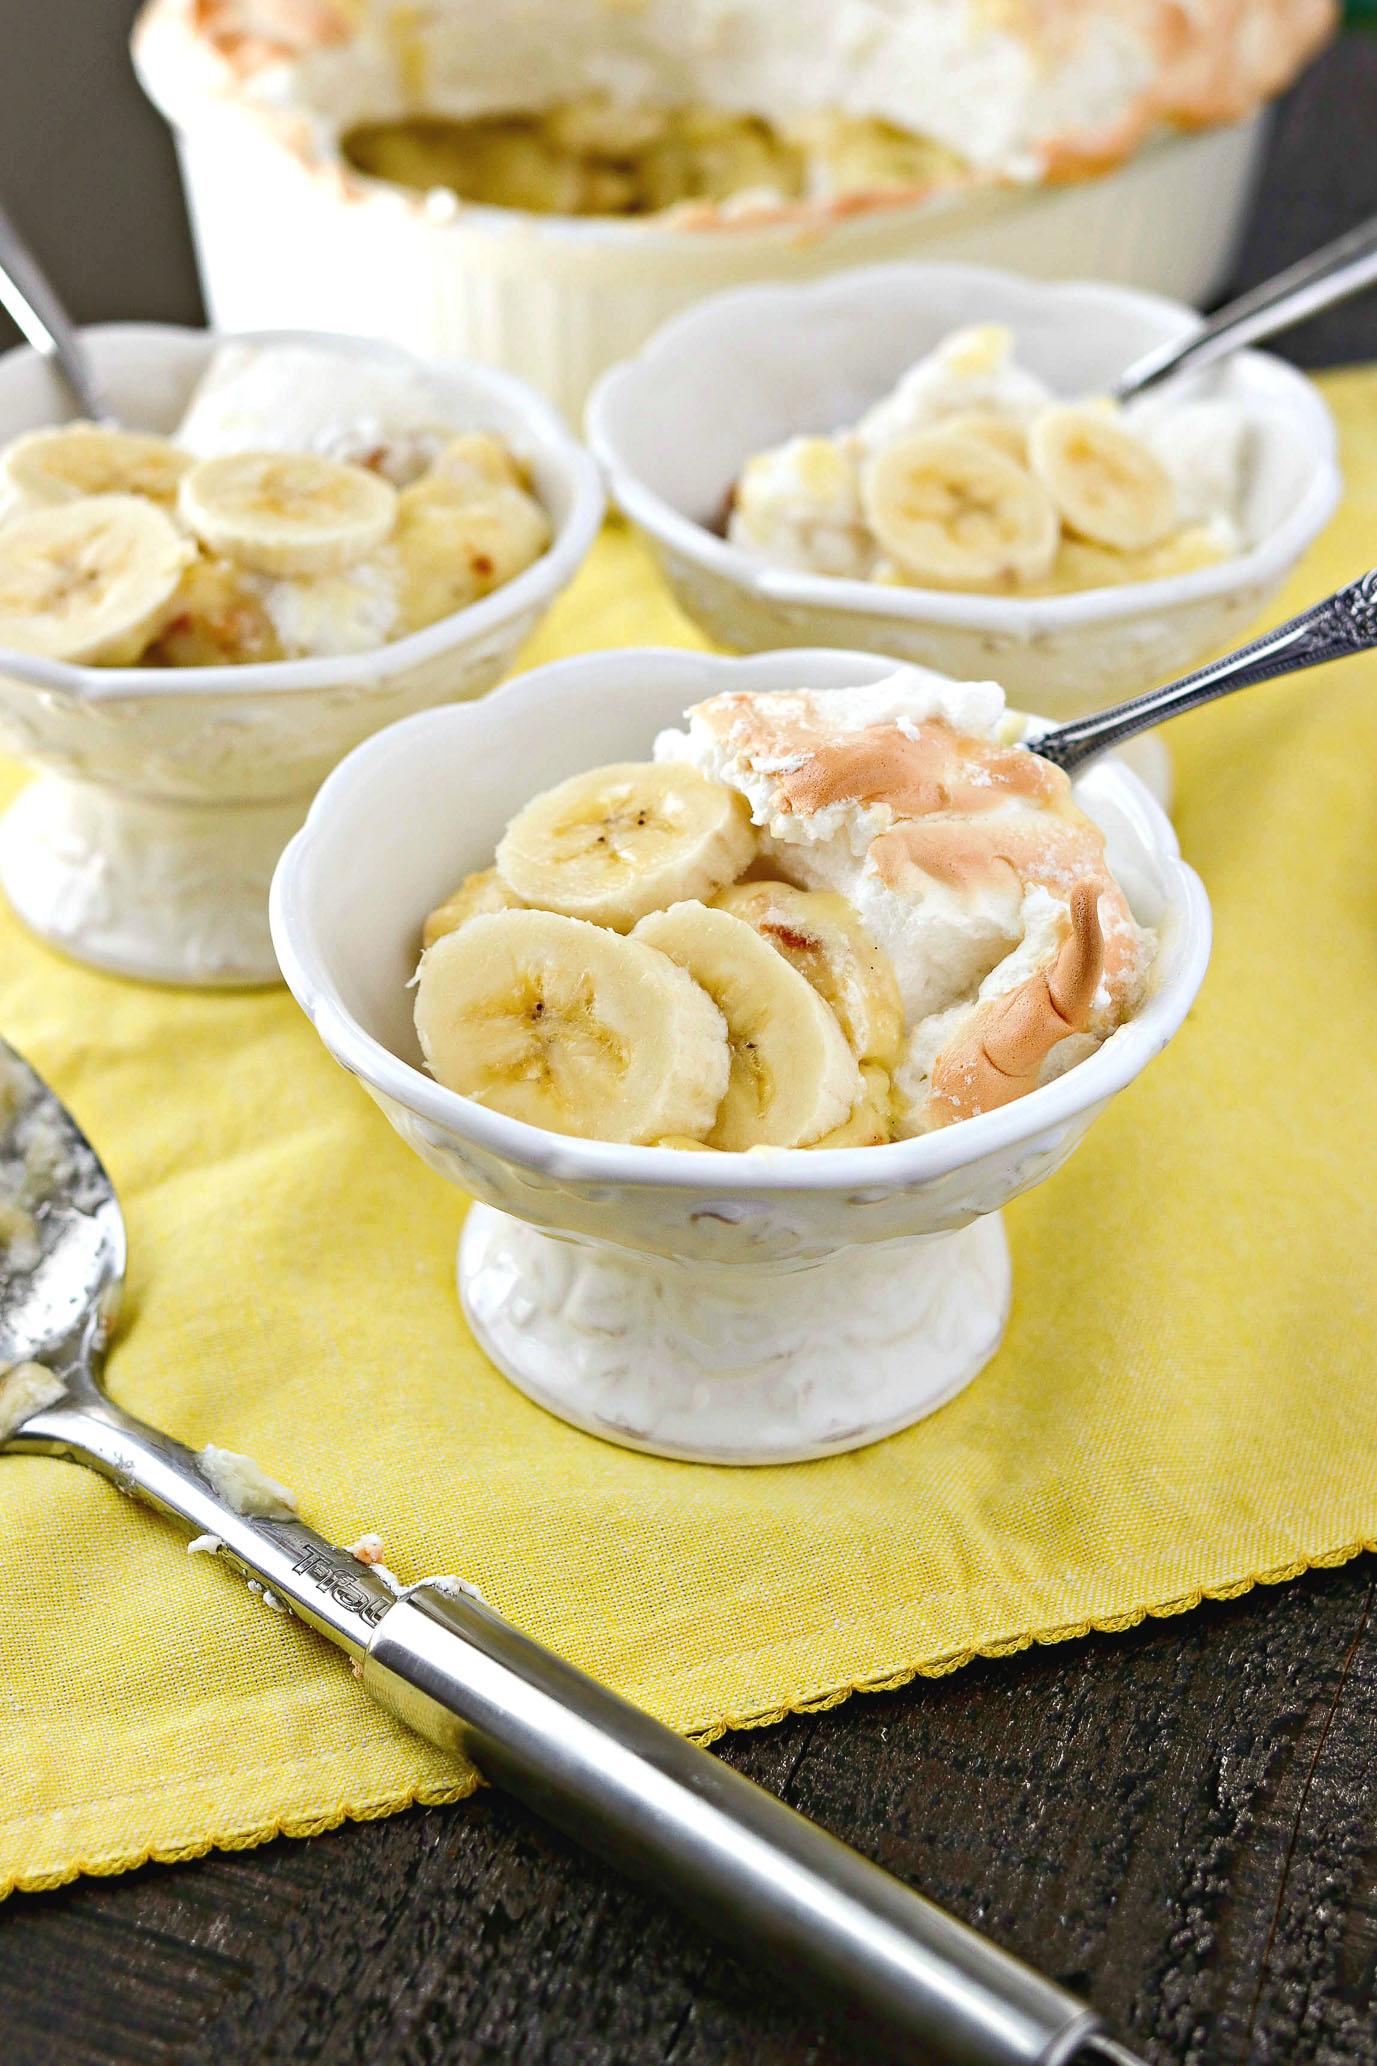 Three dishes of Warm Banana Pudding